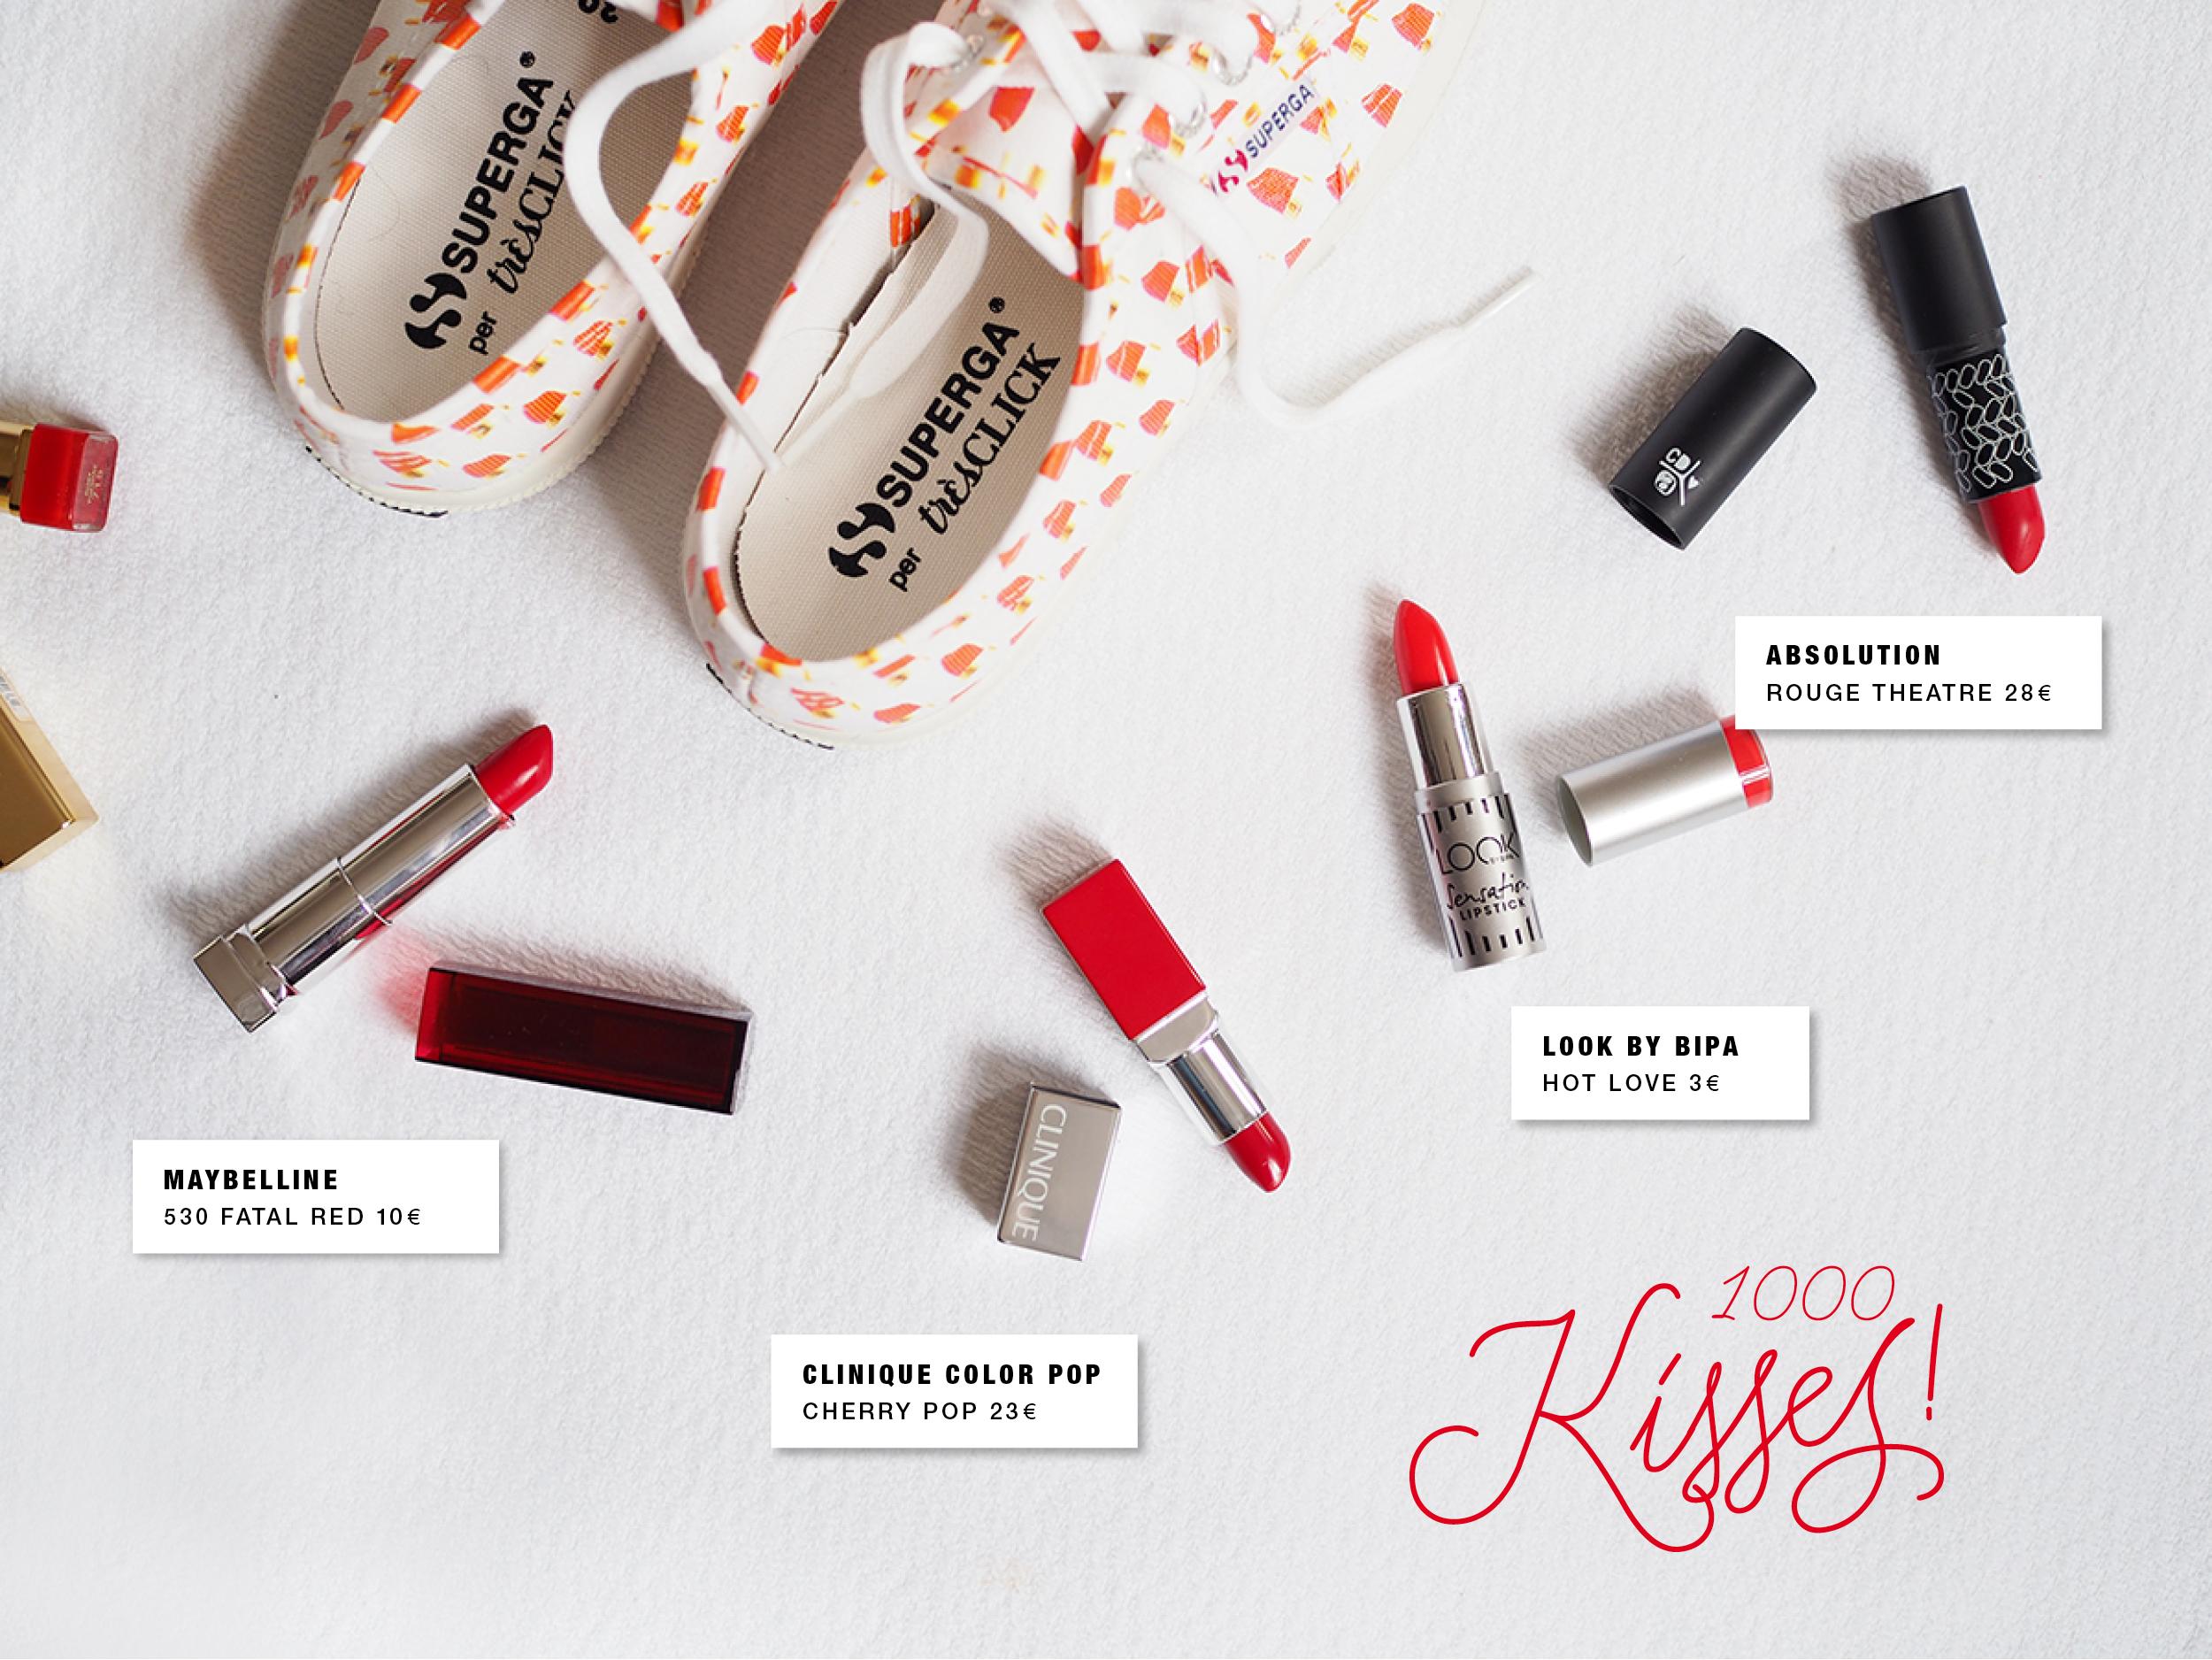 Superga X Trés Click / Lipsticks / Foxycheeks